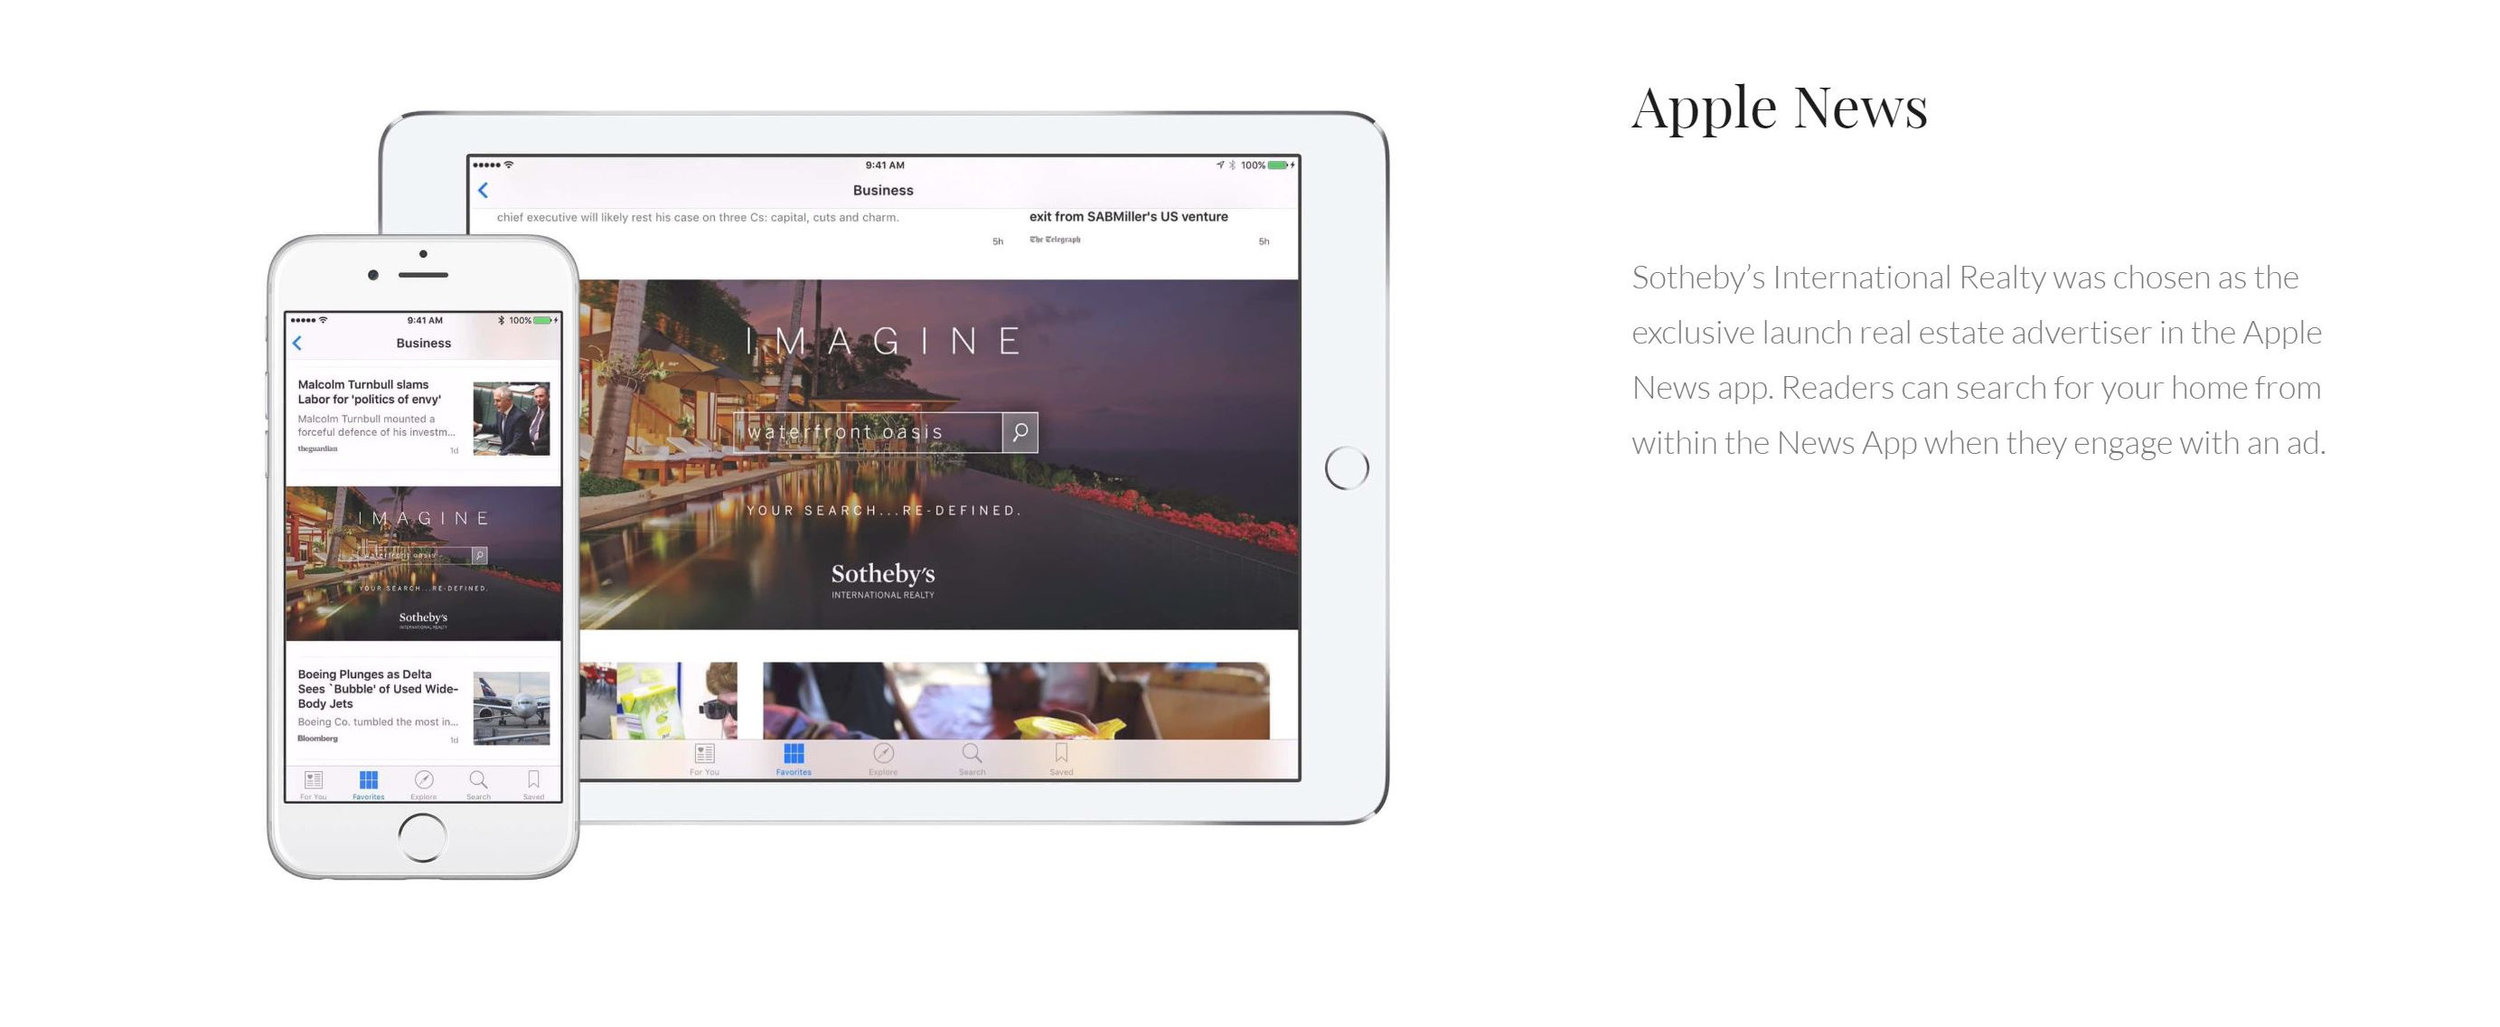 Apple_news_2.JPG